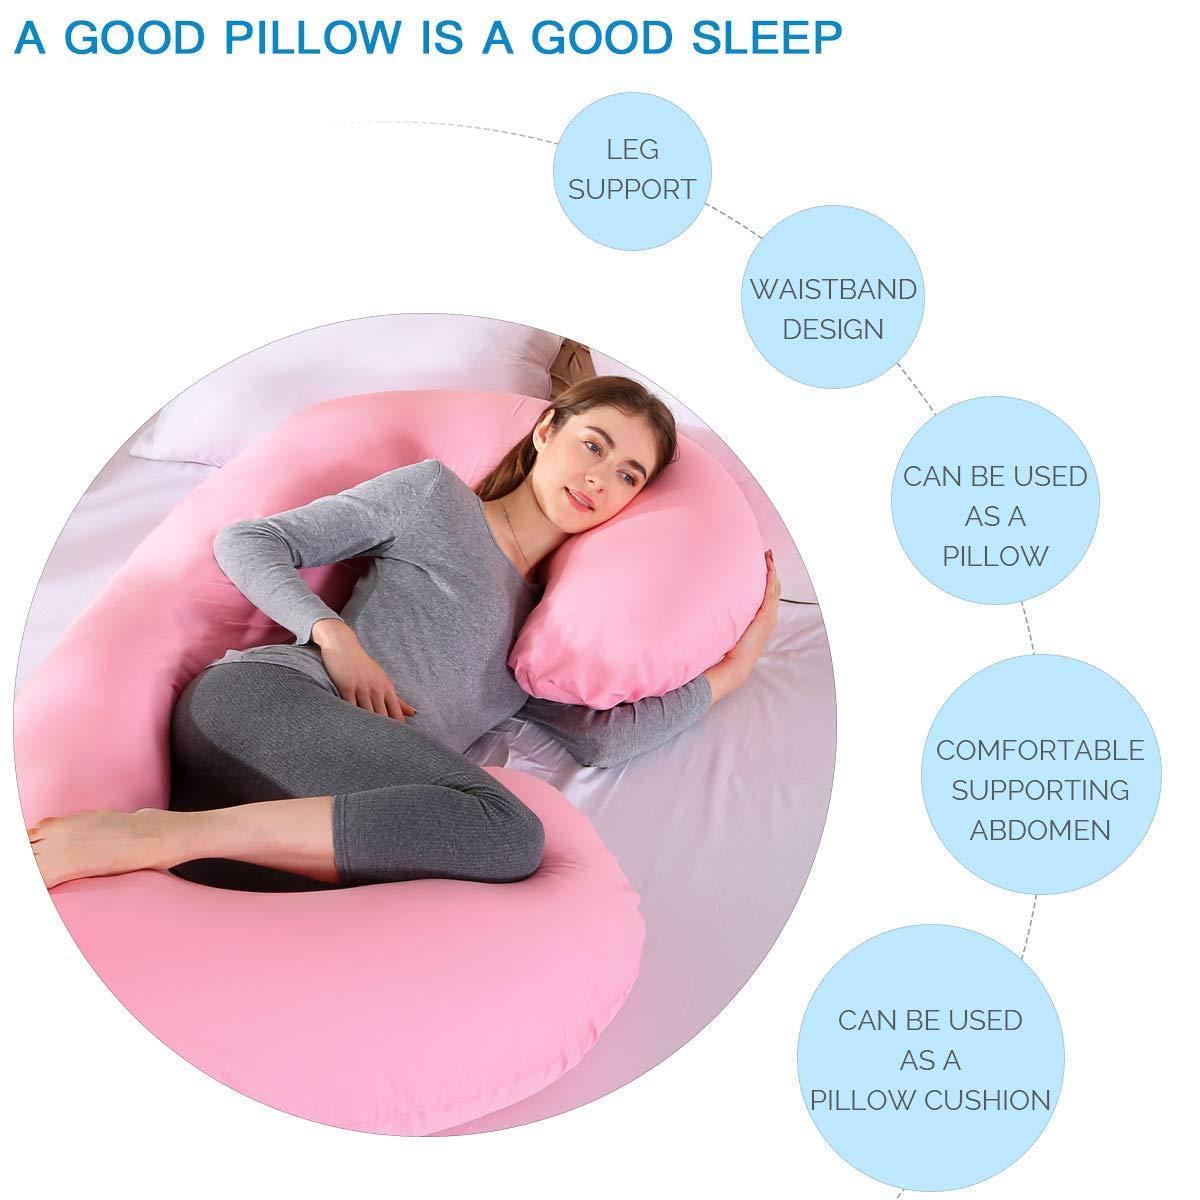 Maternity Pillow for Pregnant Women Sleeping 75 MINGPINHUIUS Pregnancy Body Pillow with Pillowcase C Shaped Cotton Pillowcase, Grey//Blue 145cm Fuller Cotton C Shaped 2.5kg